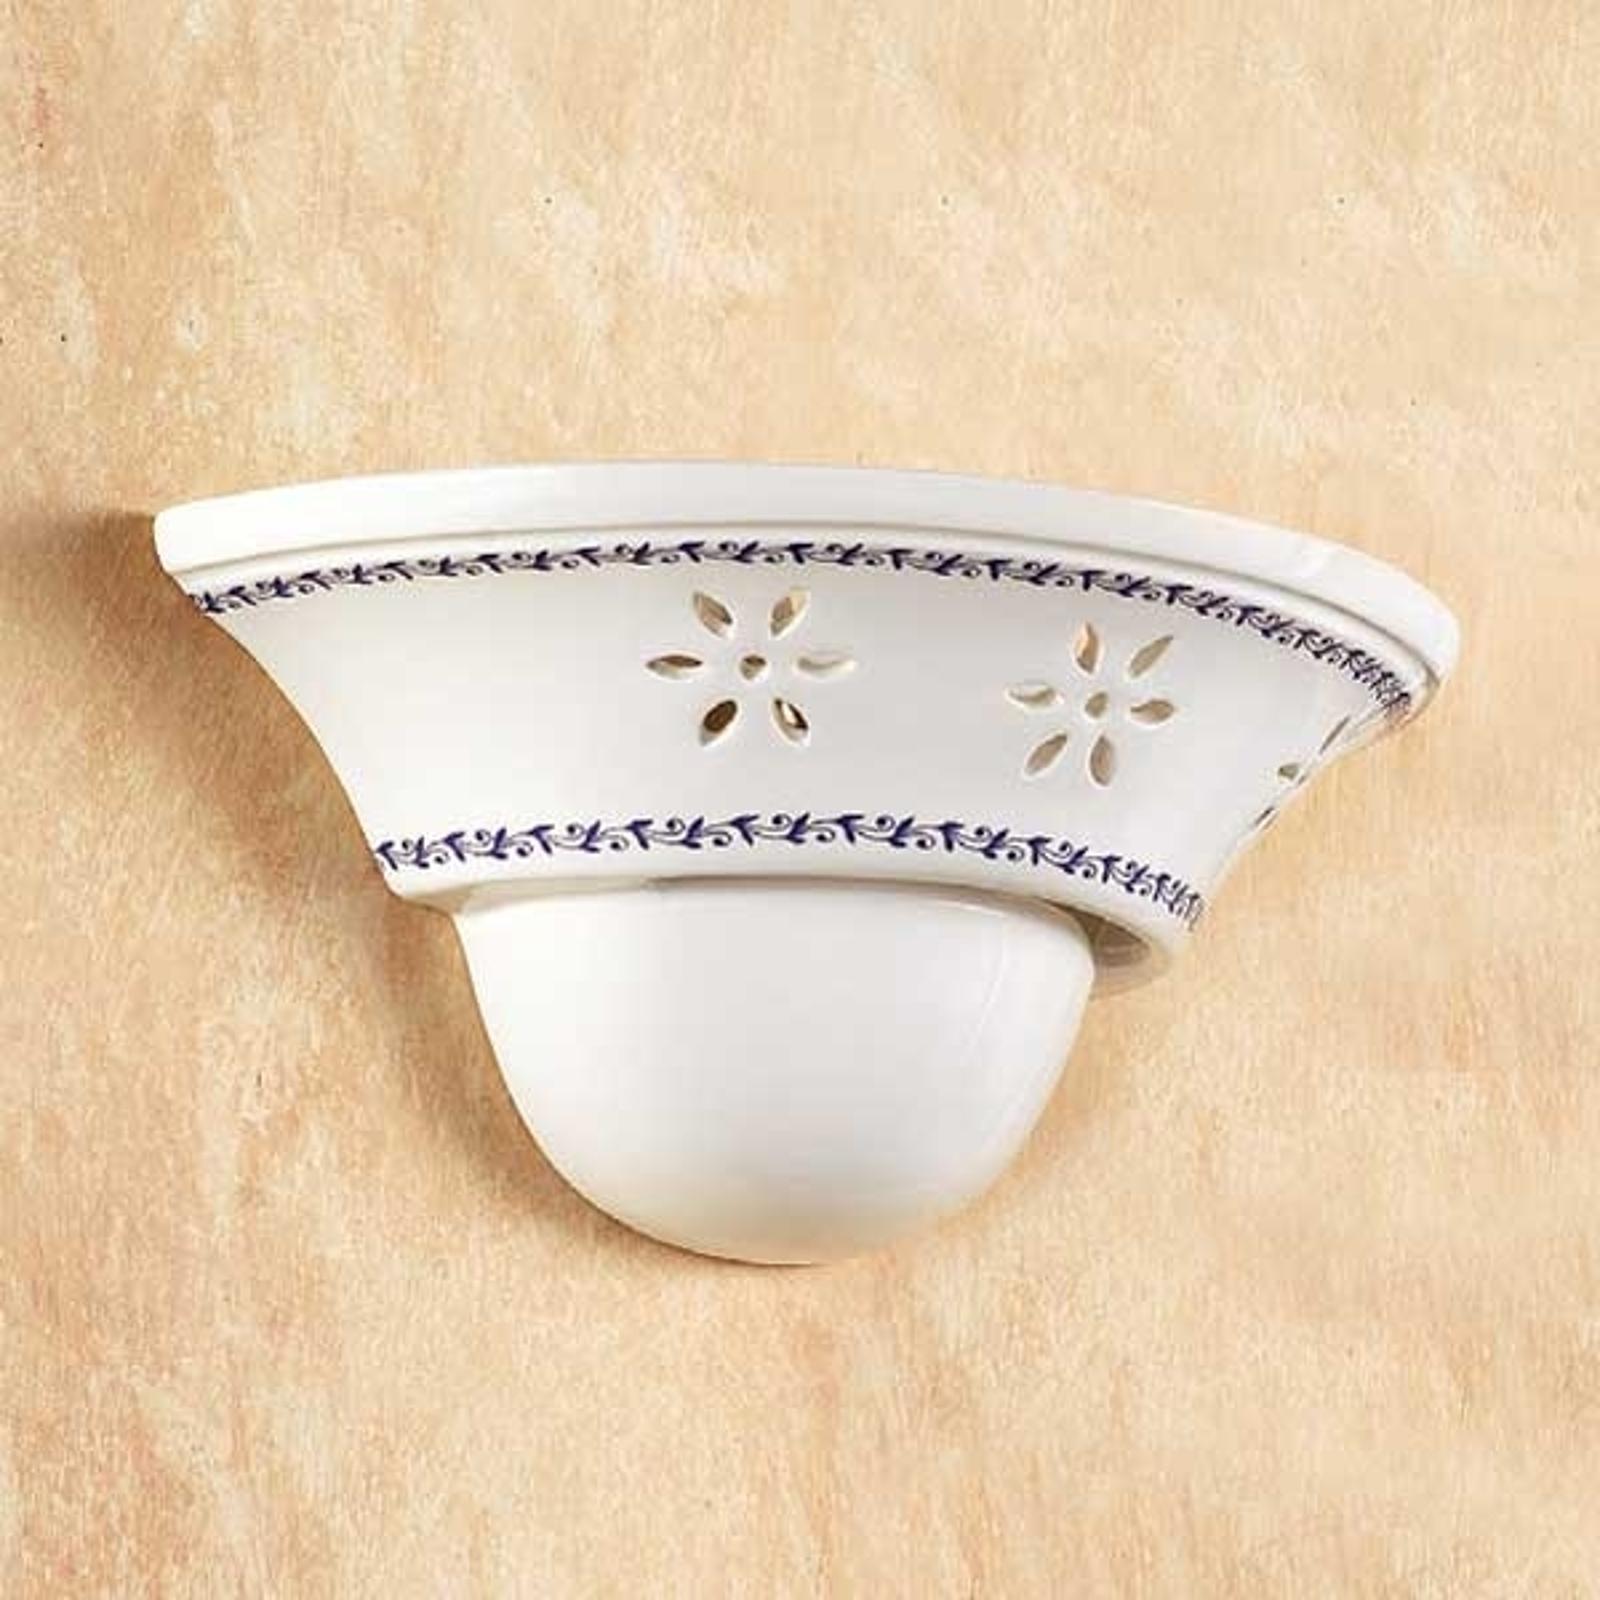 Aplique de pared Il Punti con placa de cerámica